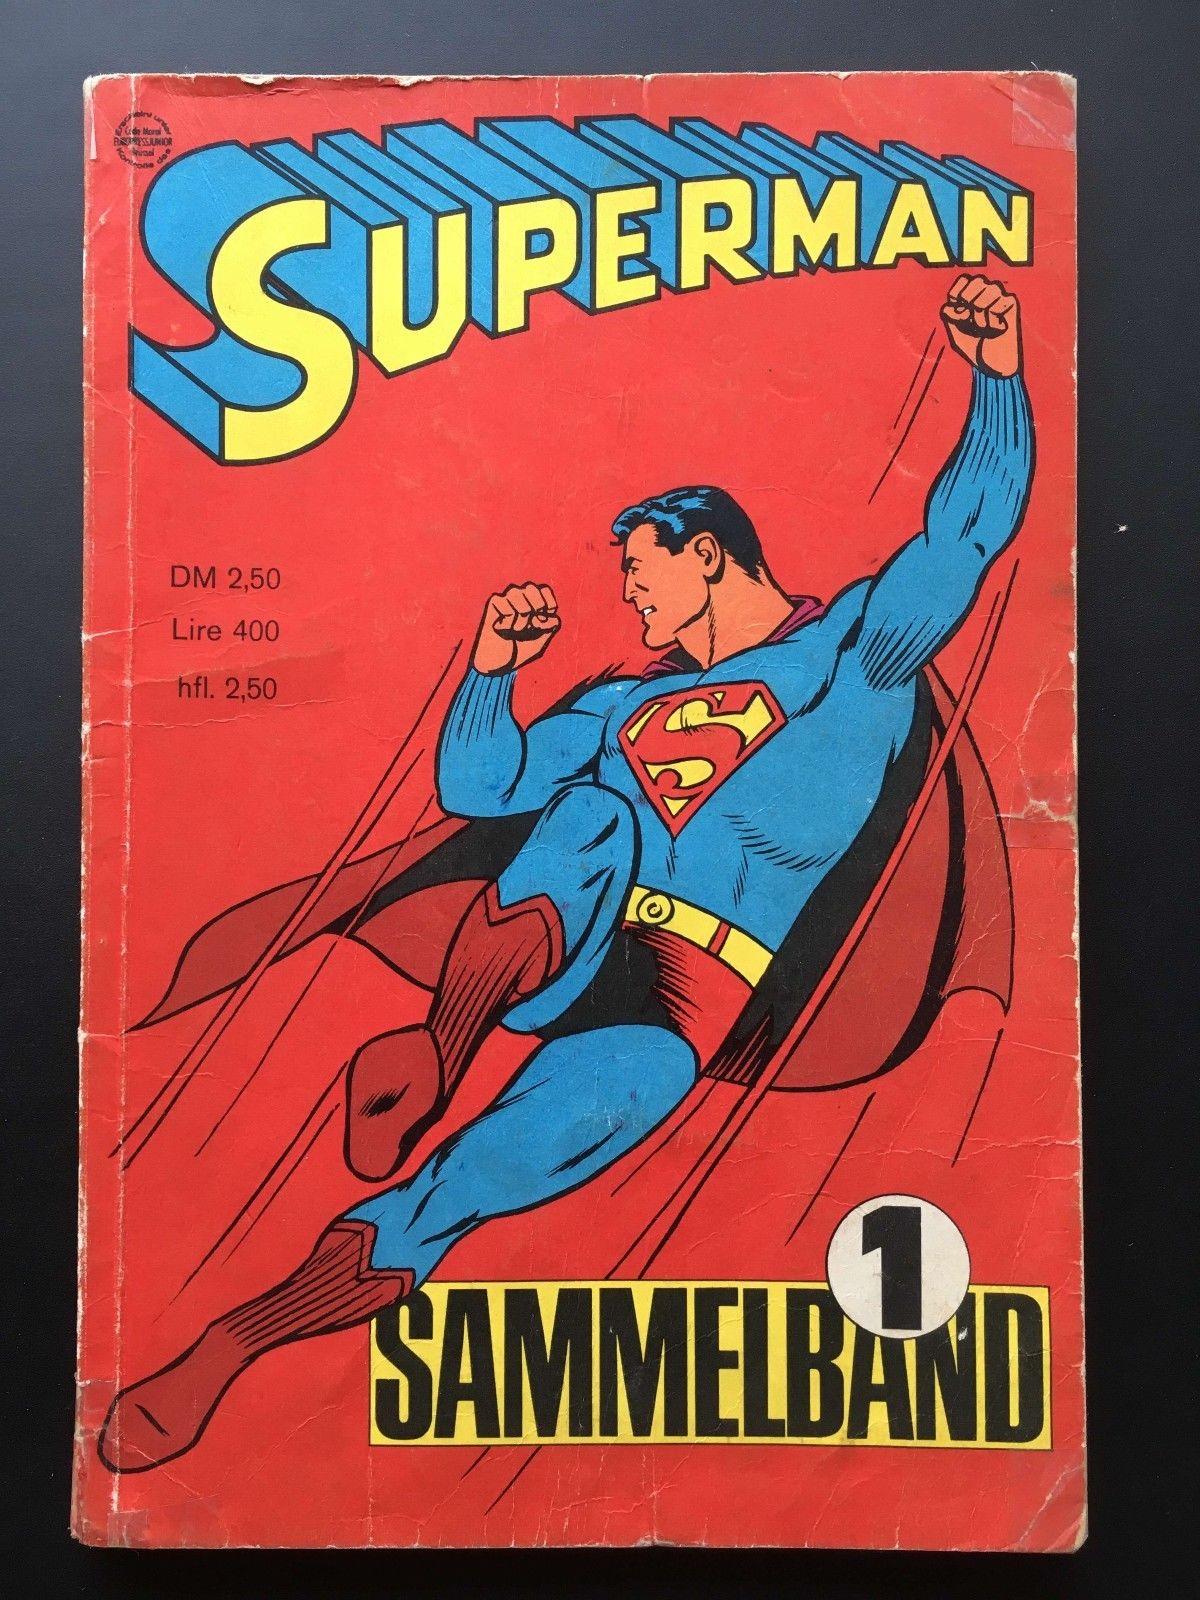 SUPERMAN SAMMELBAND NR. 1 *SUPERMAN HEFT 1, 2, 3, 4* EHAPA 1966 Z3+